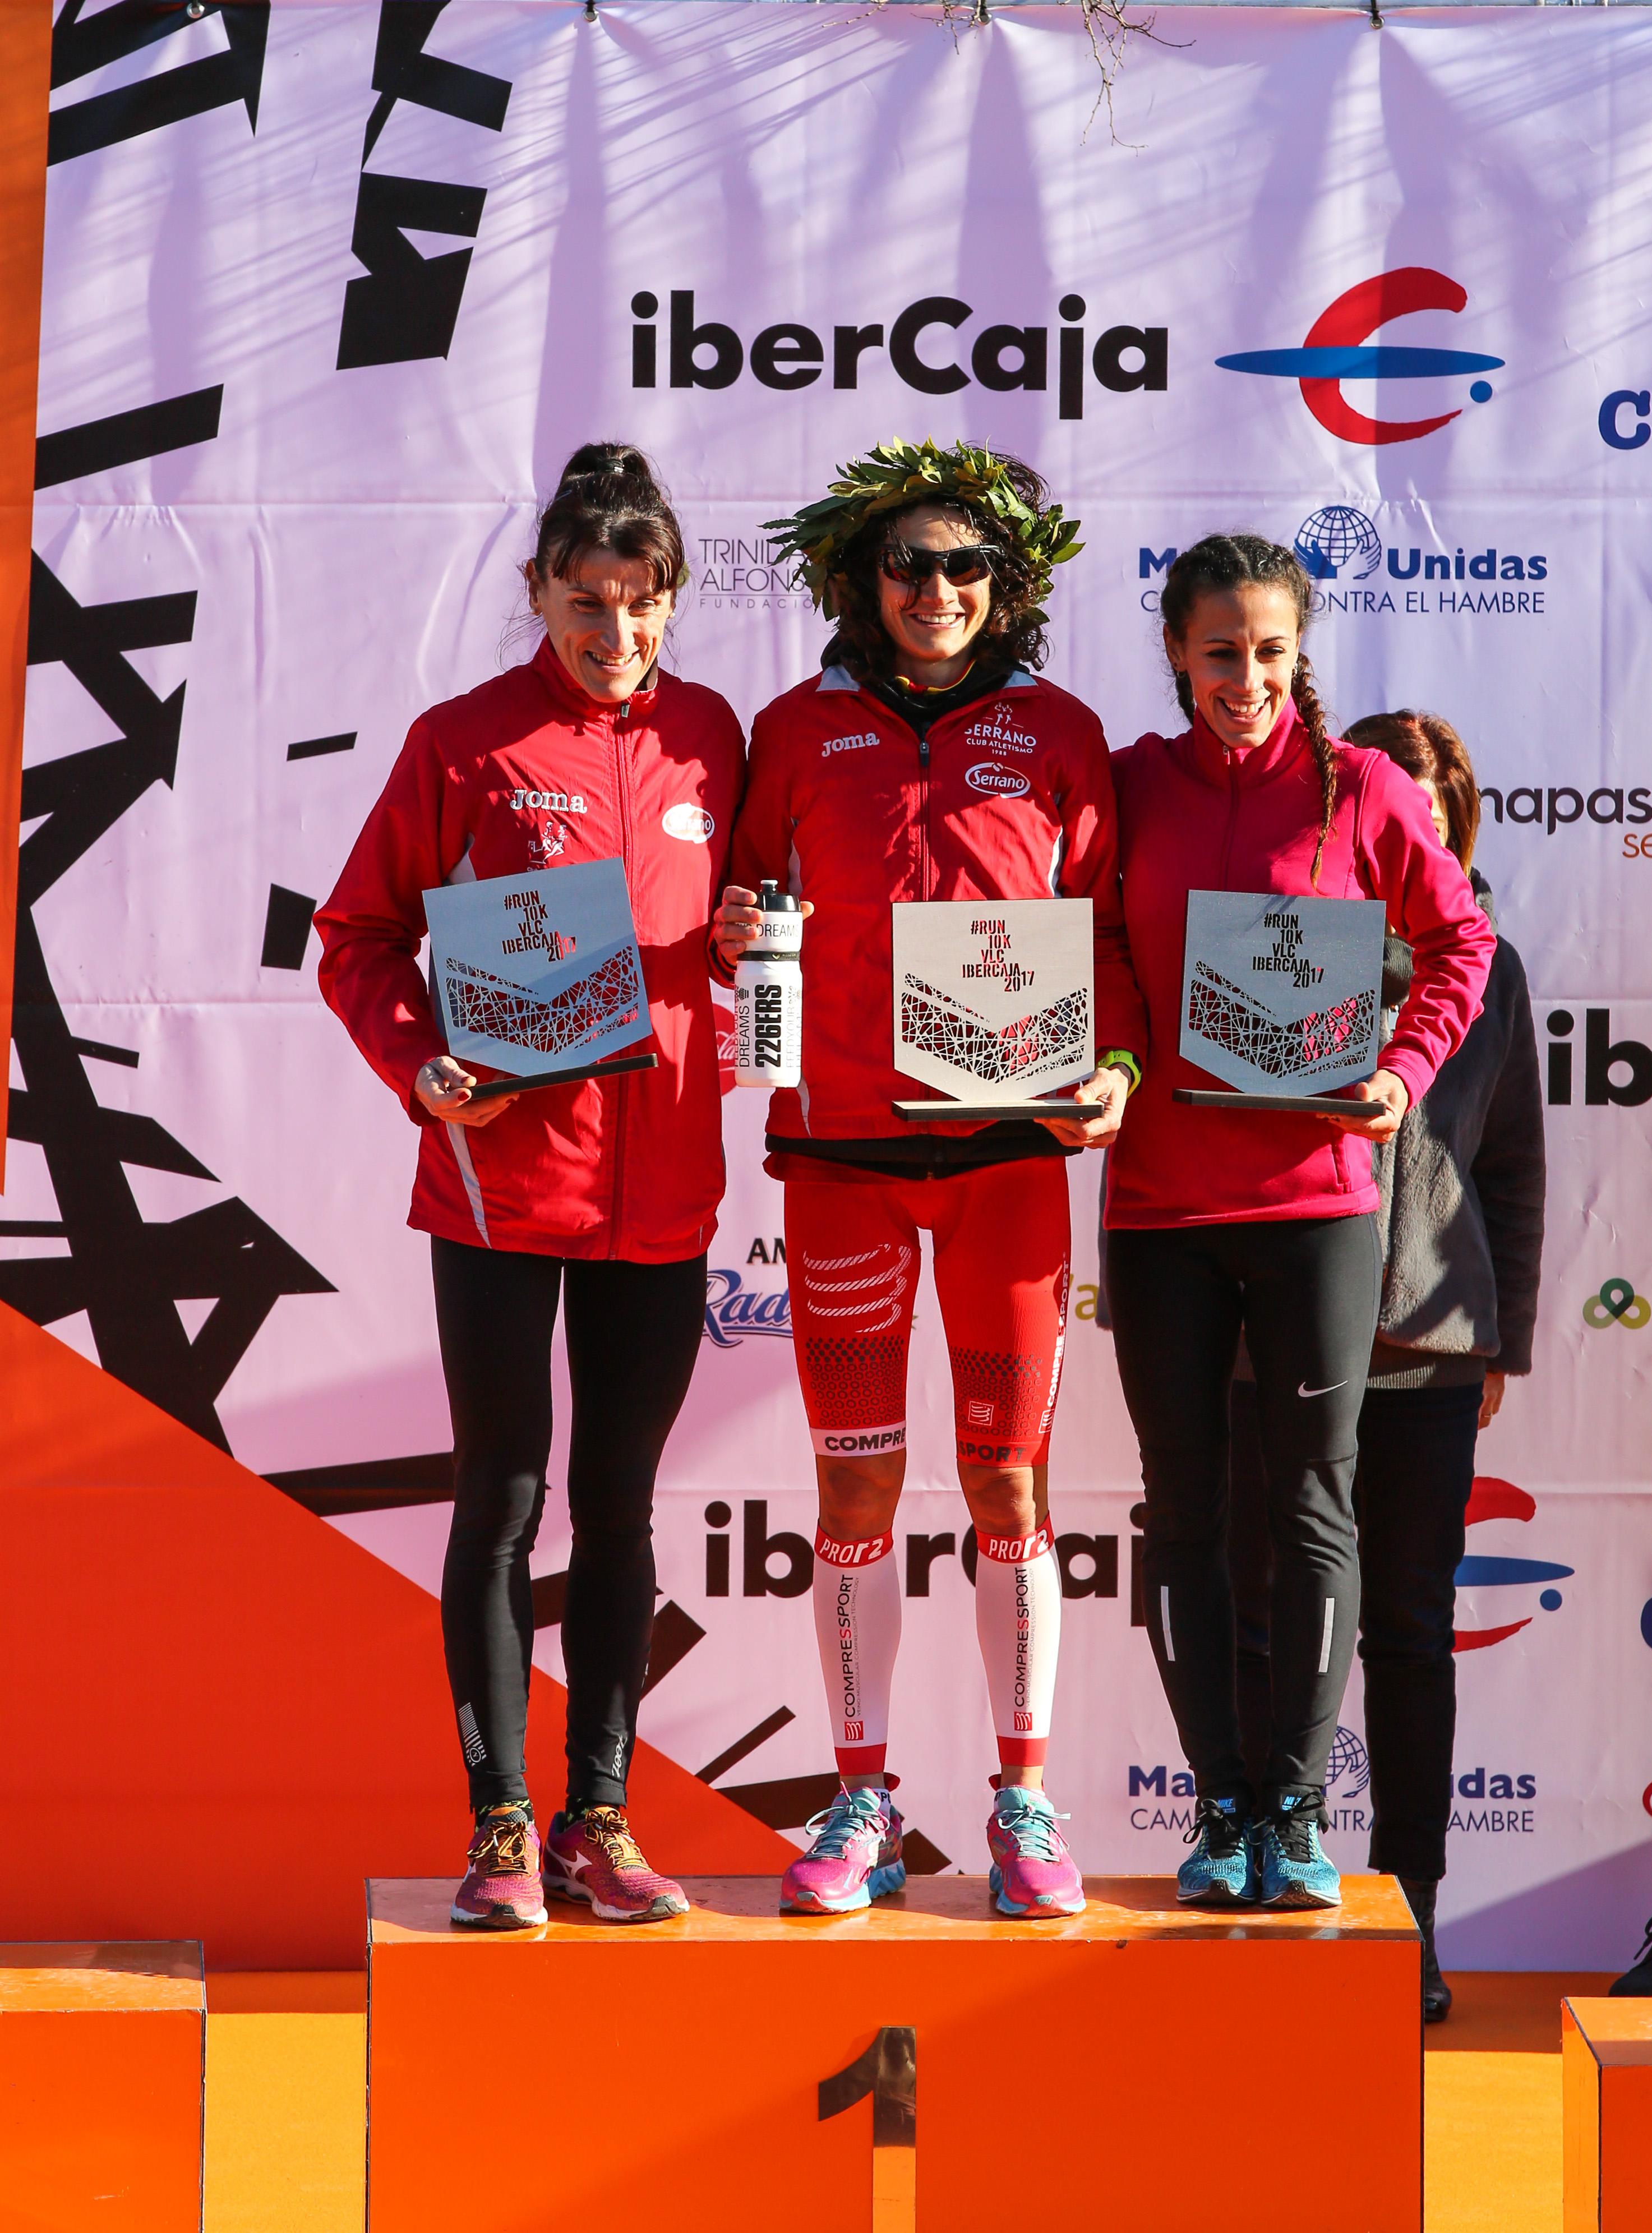 Podium femenino 10K Valencia 2017